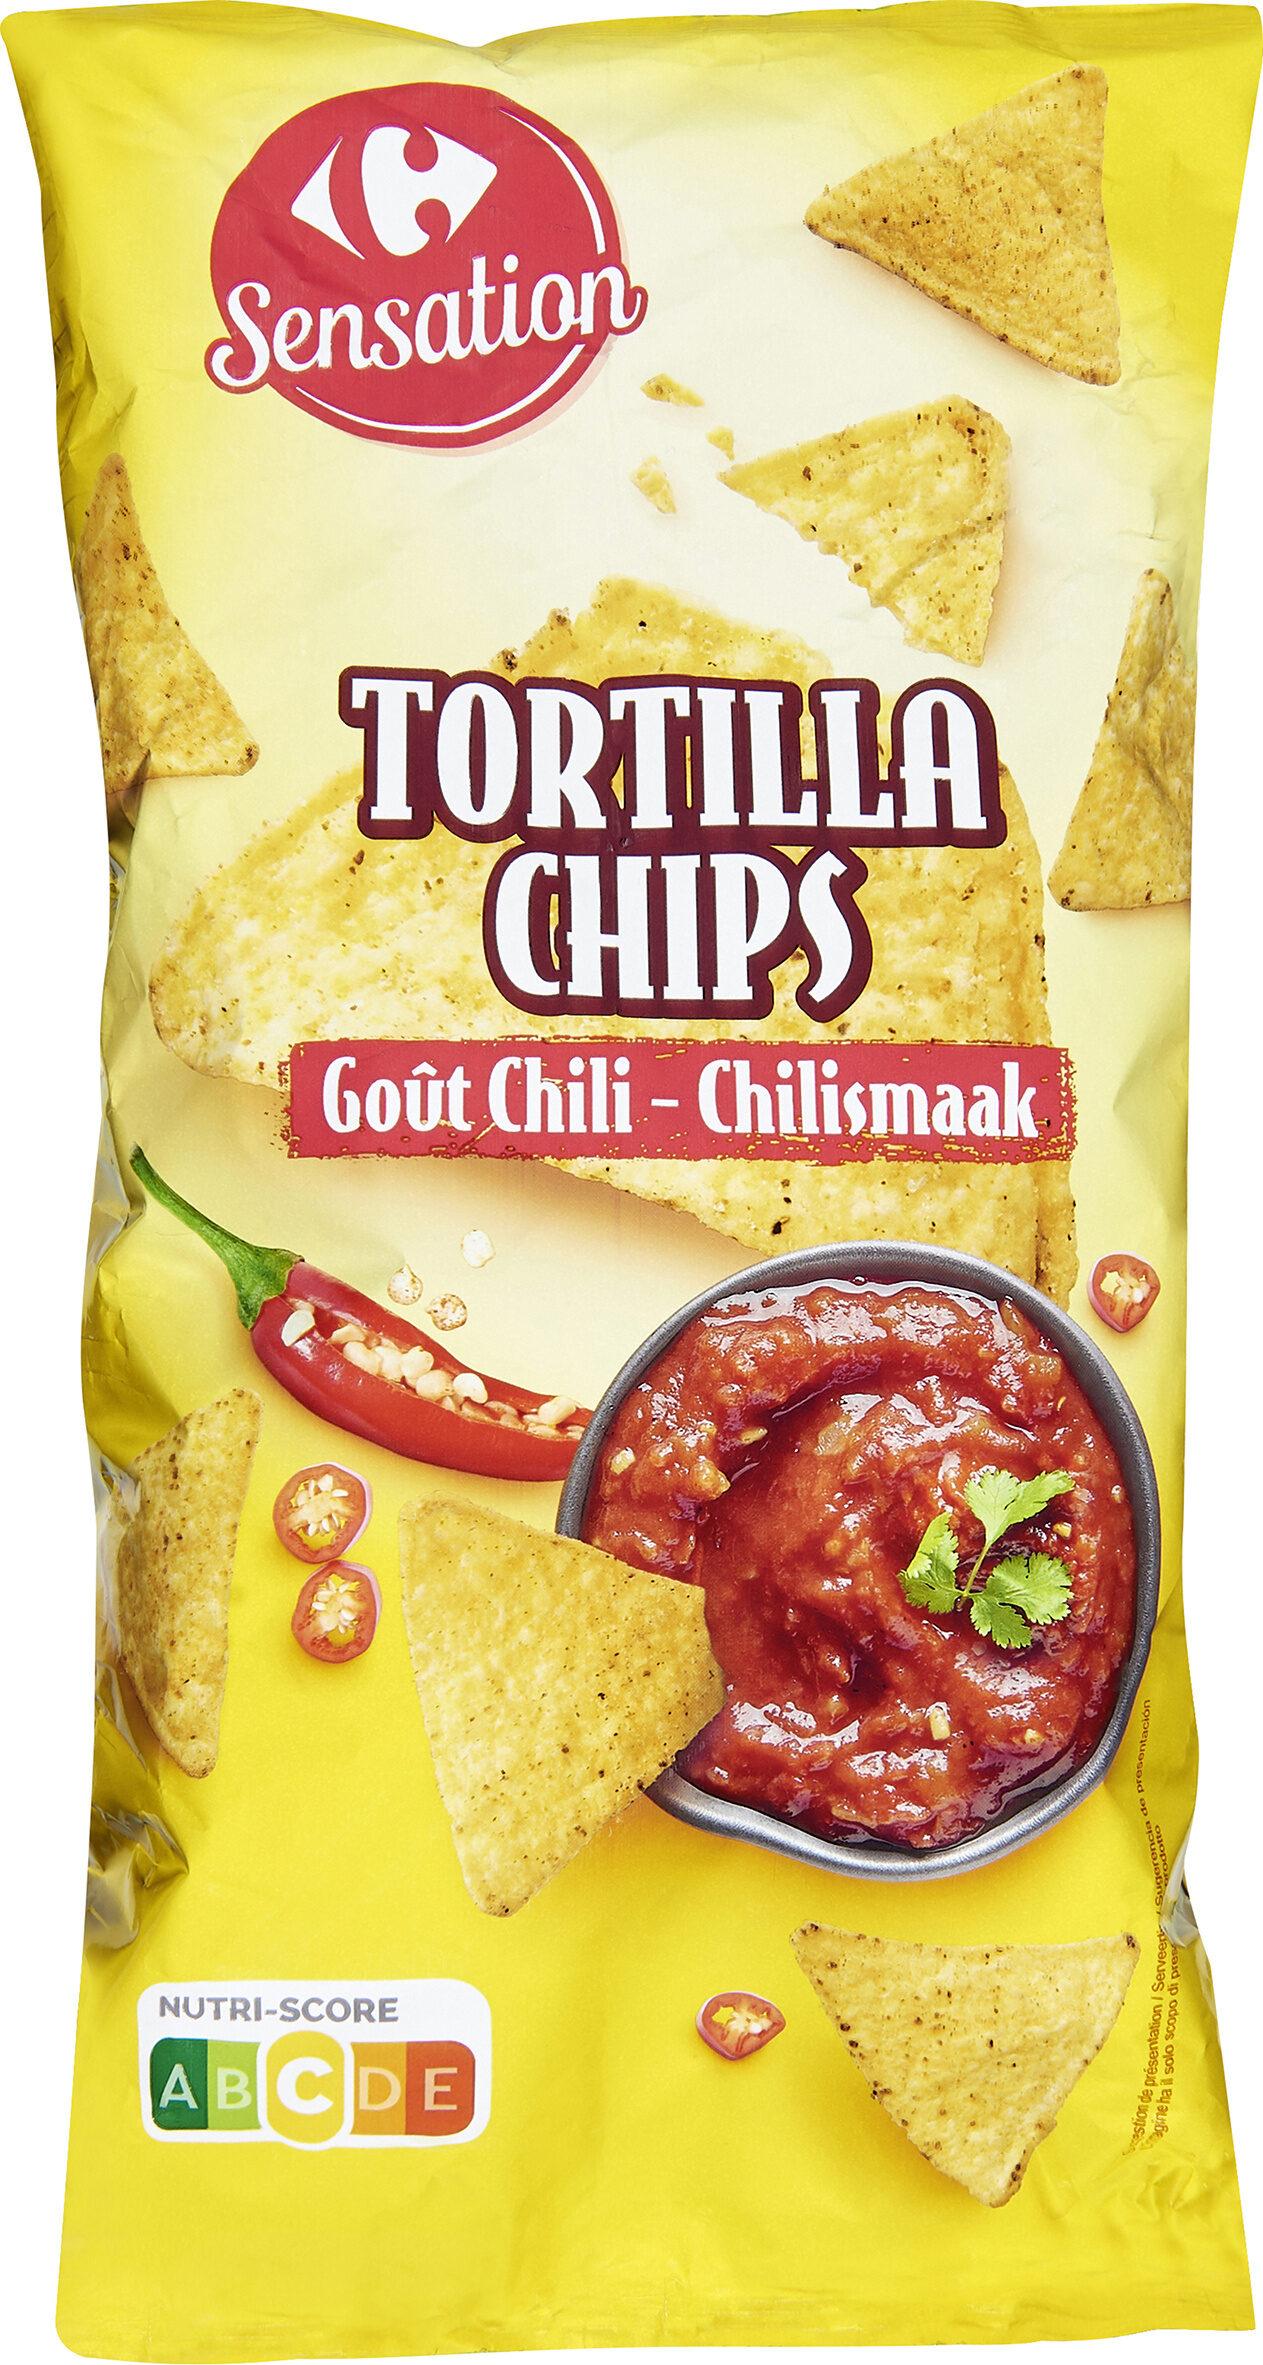 TORTILLA CHIPS GOÛT CHILI TASTE OF MEXICO* * Saveurs du MEXIQUE - Product - fr